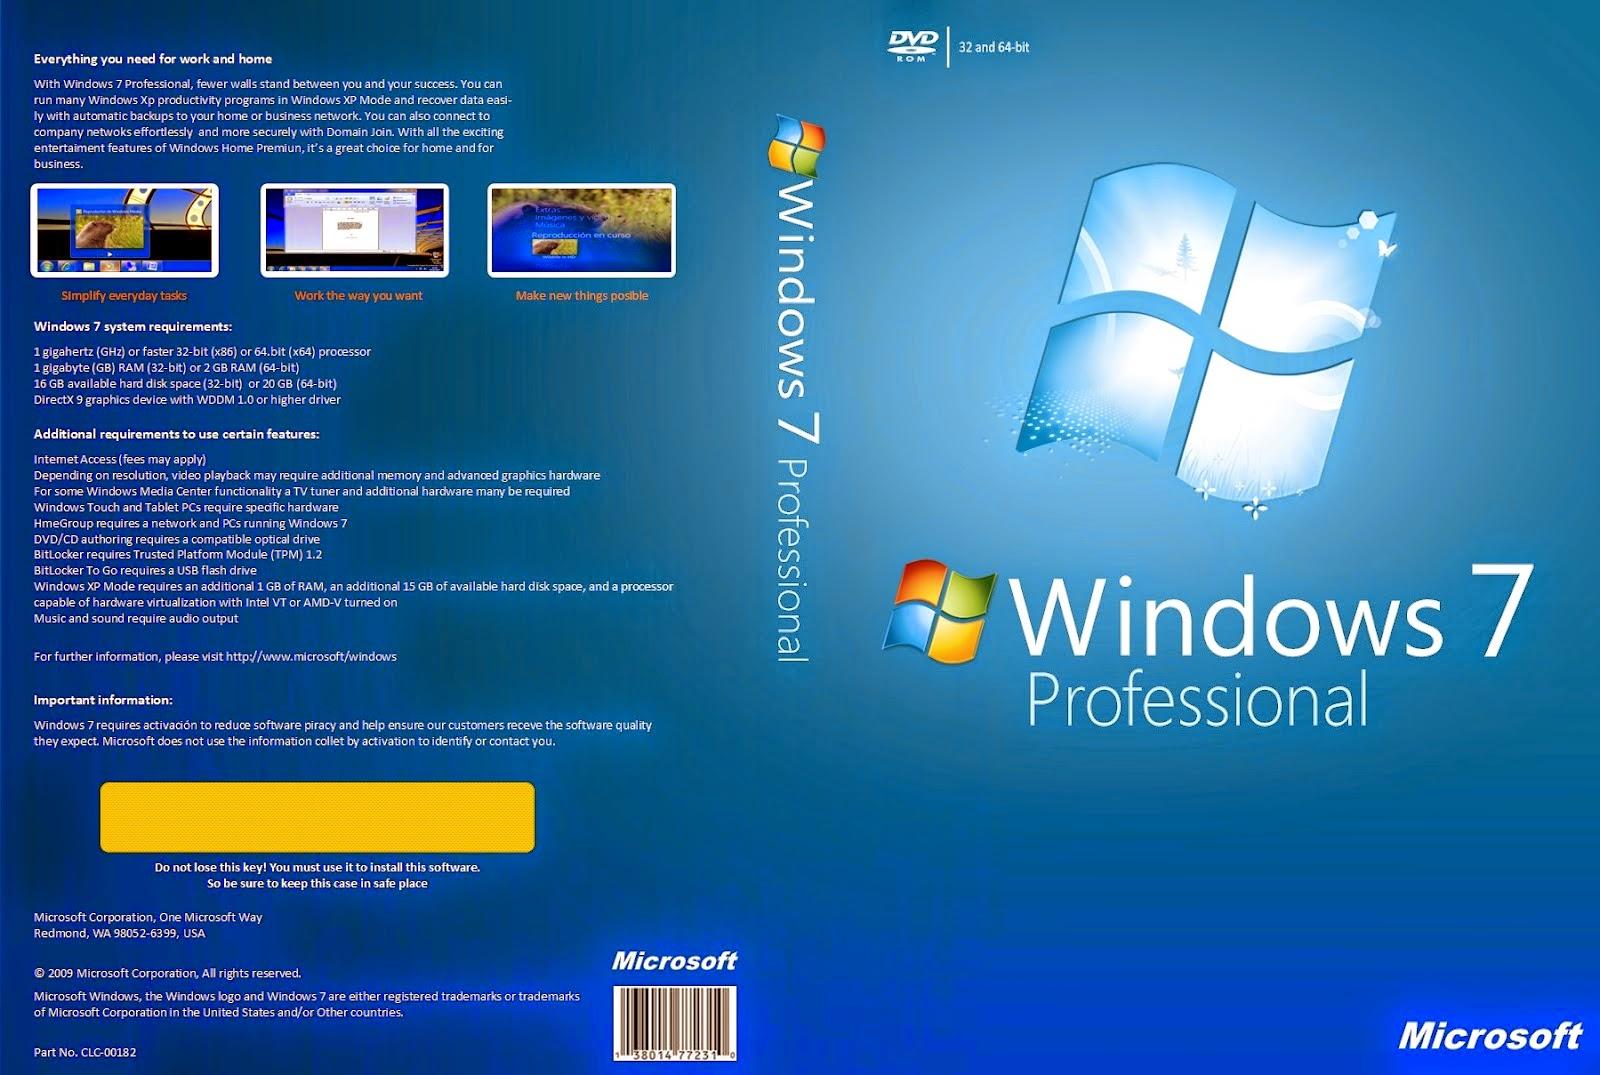 windows 7 professional iso crack